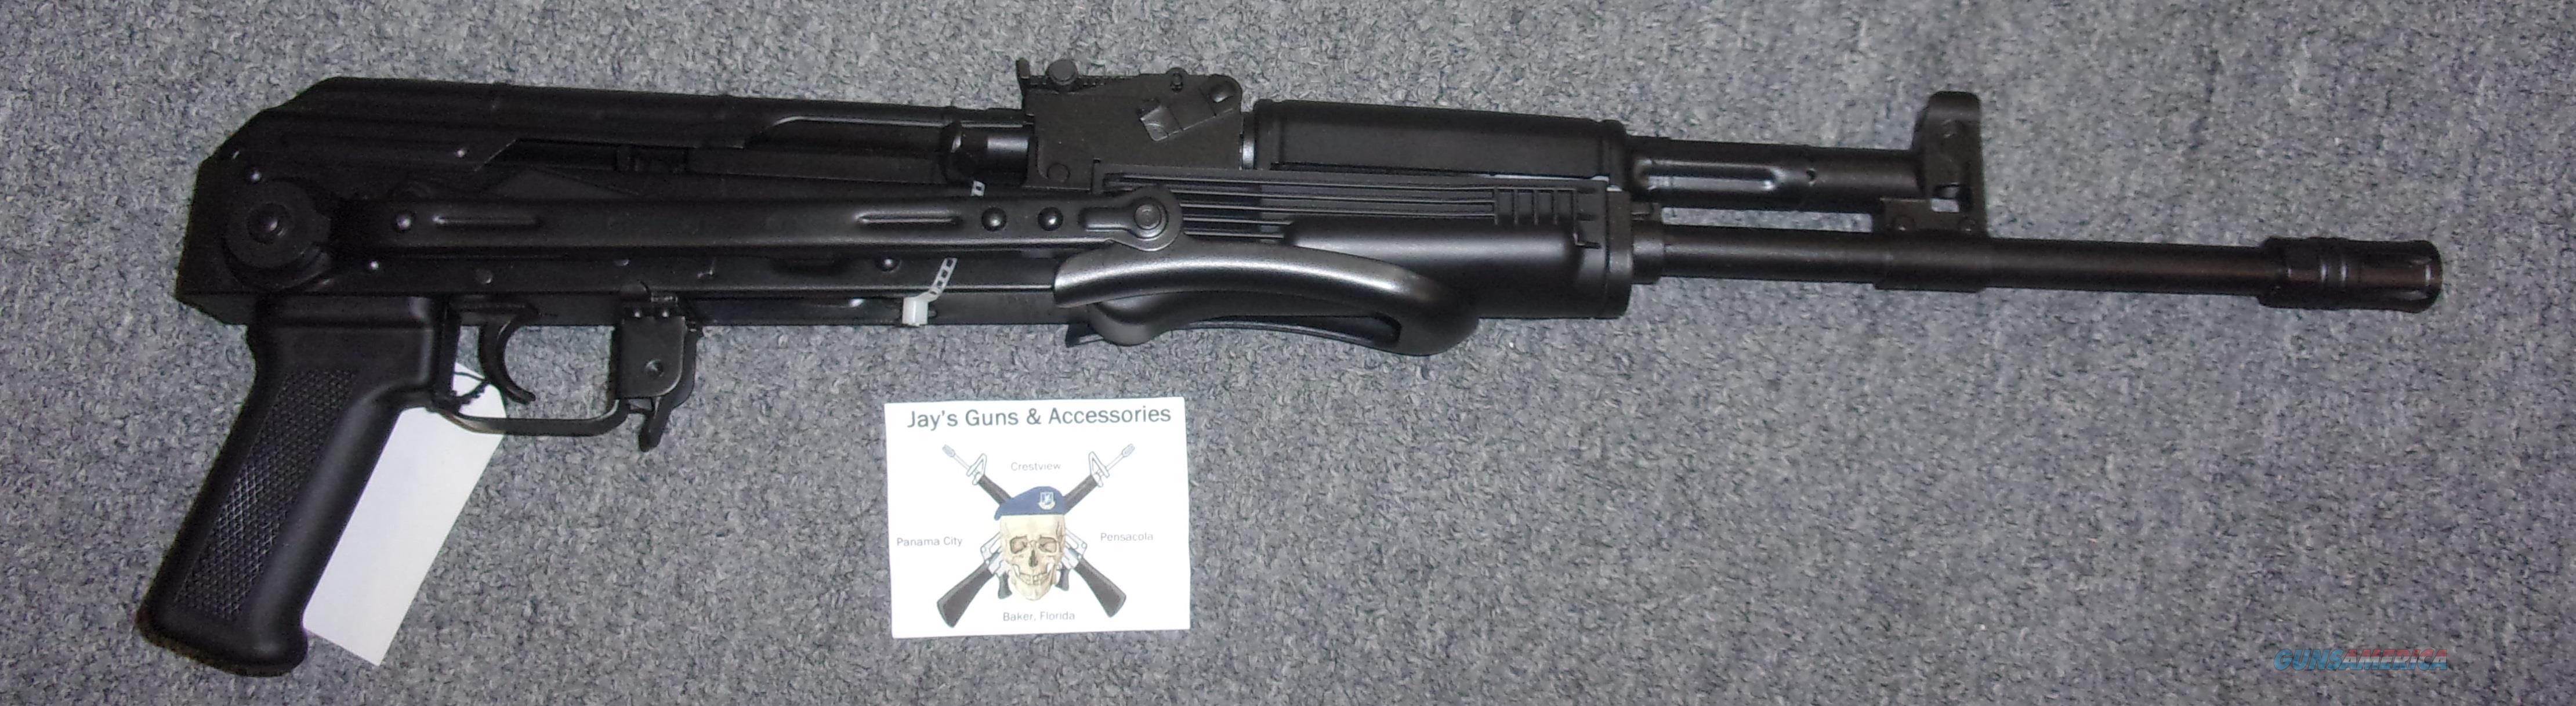 DDI 47U  Guns > Rifles > AK-47 Rifles (and copies) > Folding Stock